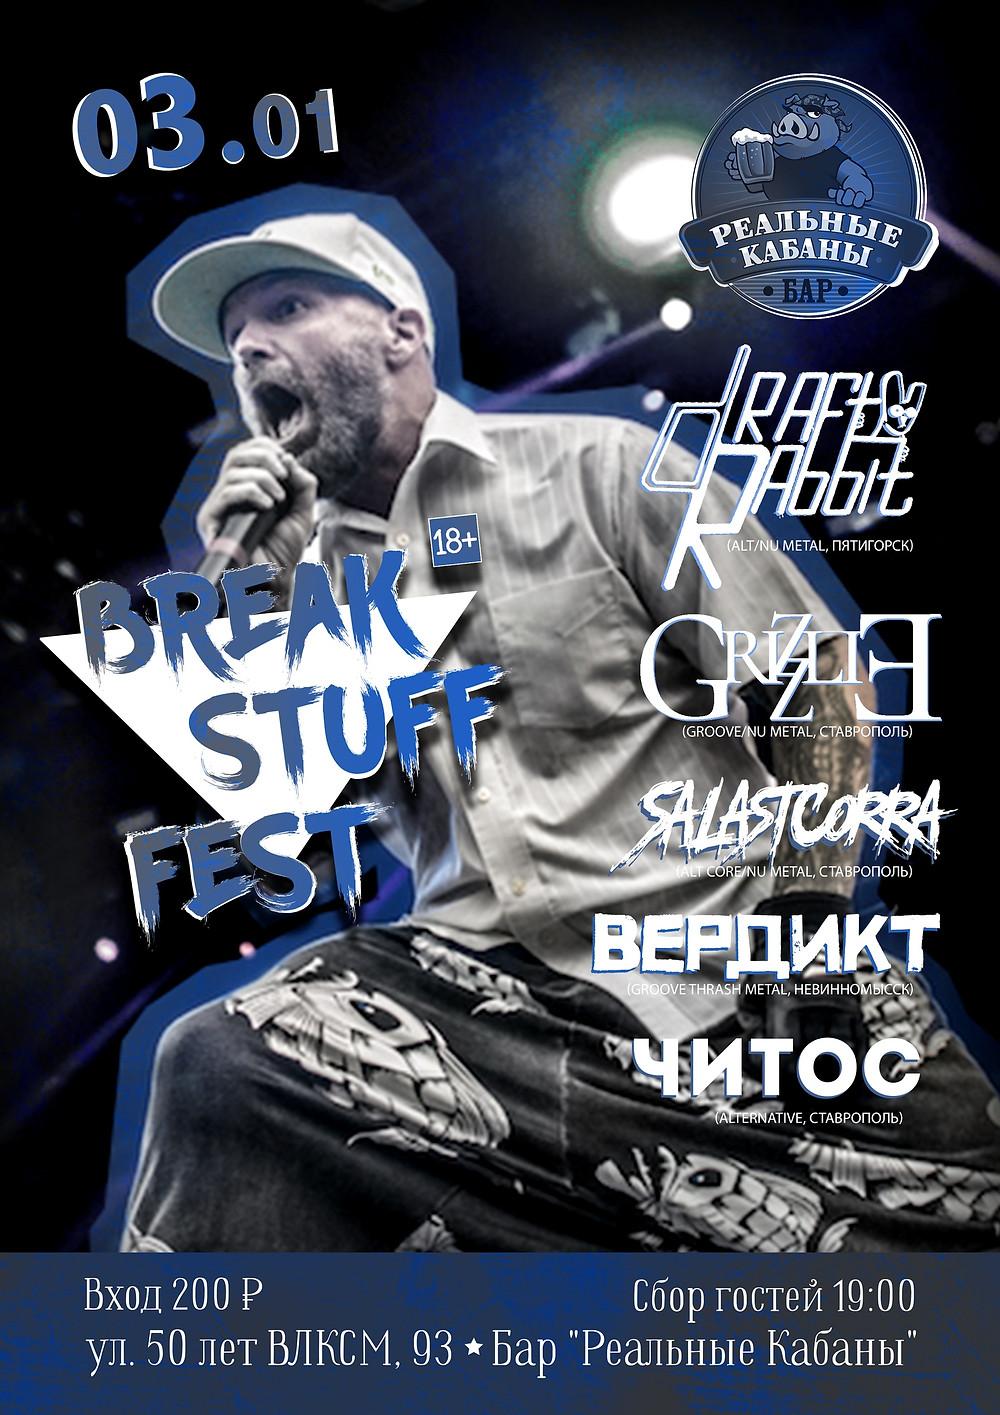 Break Stuff Fest Ставрополь Draft Rabbit